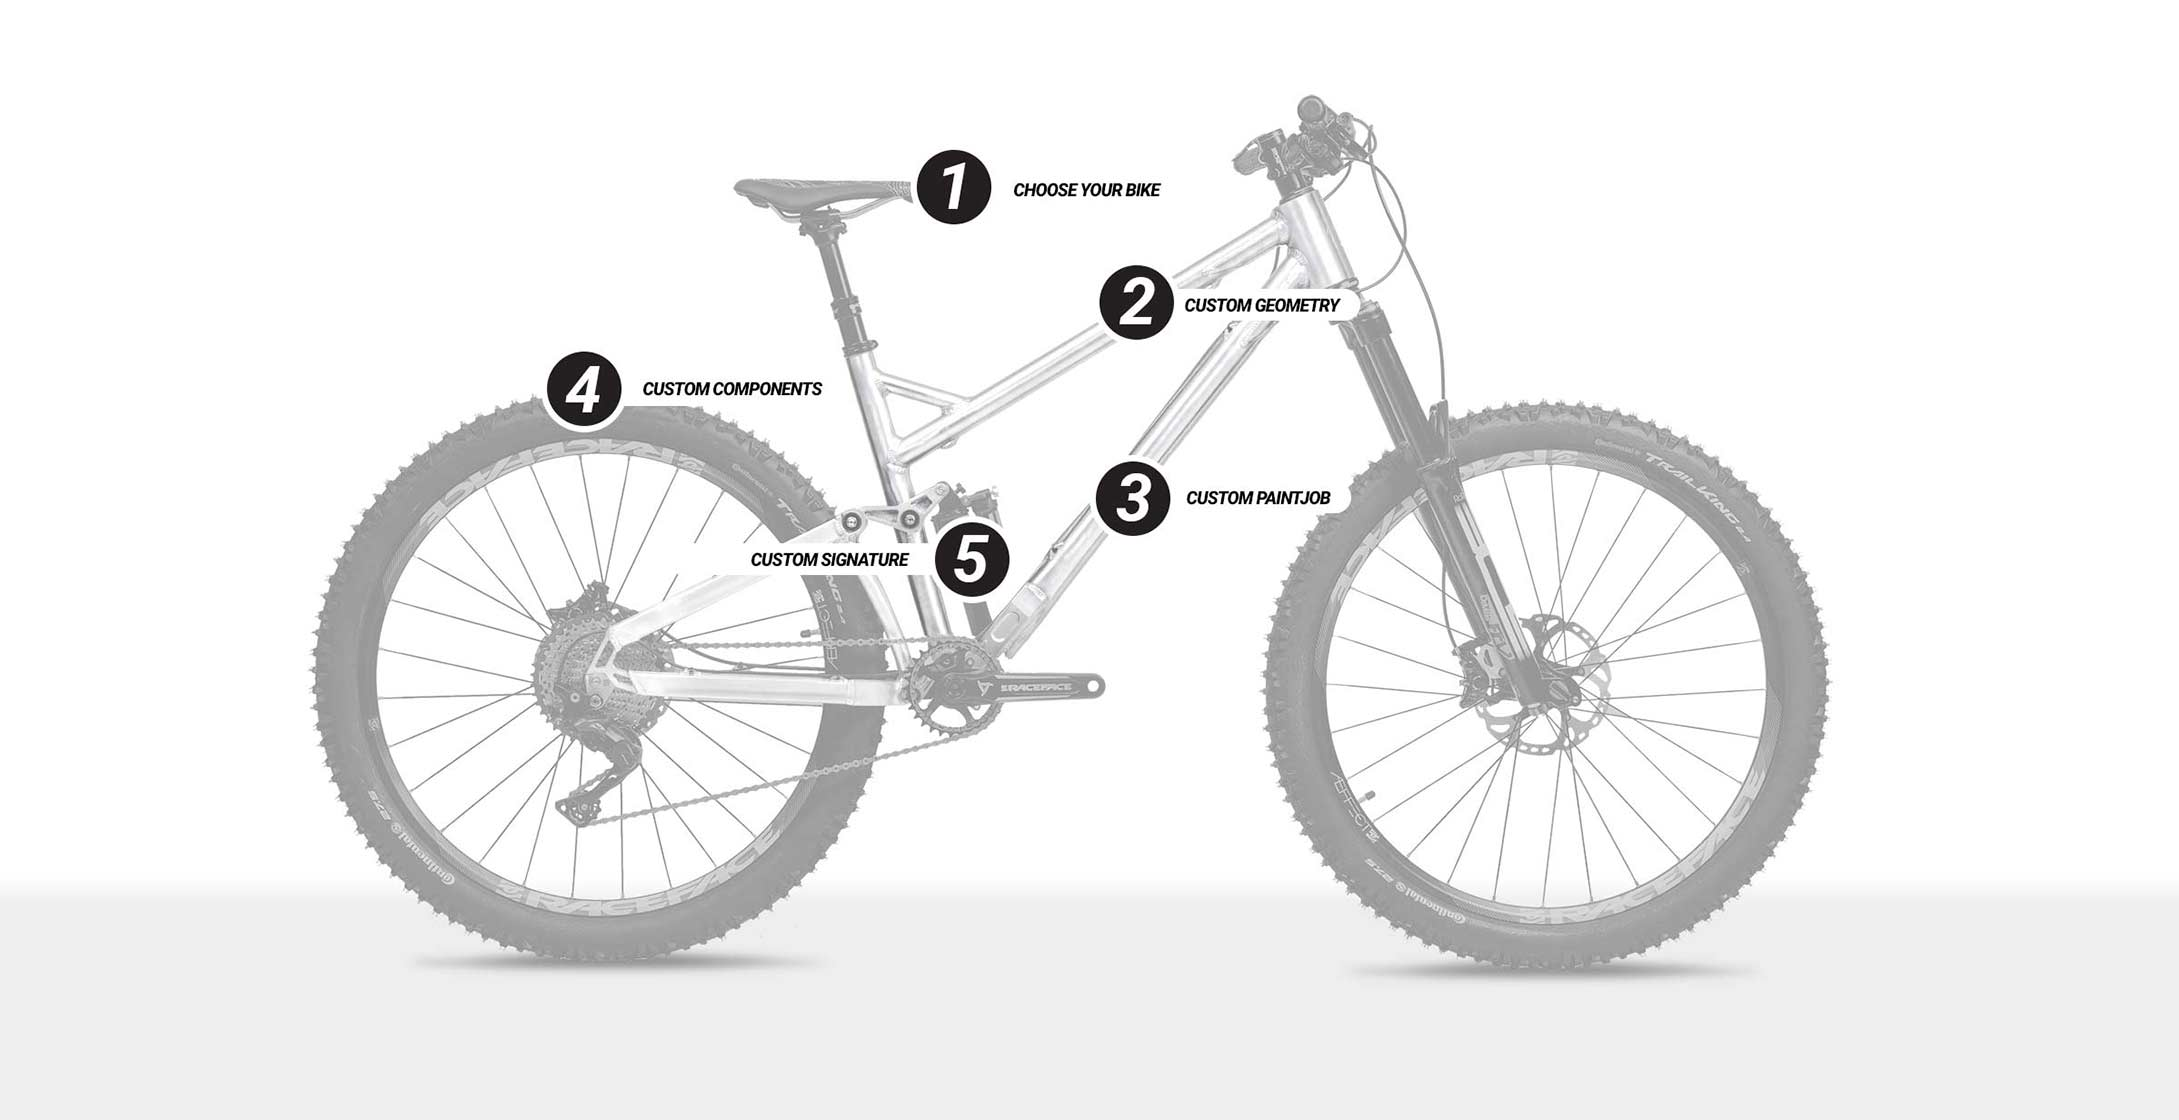 Custom bike - choose your details